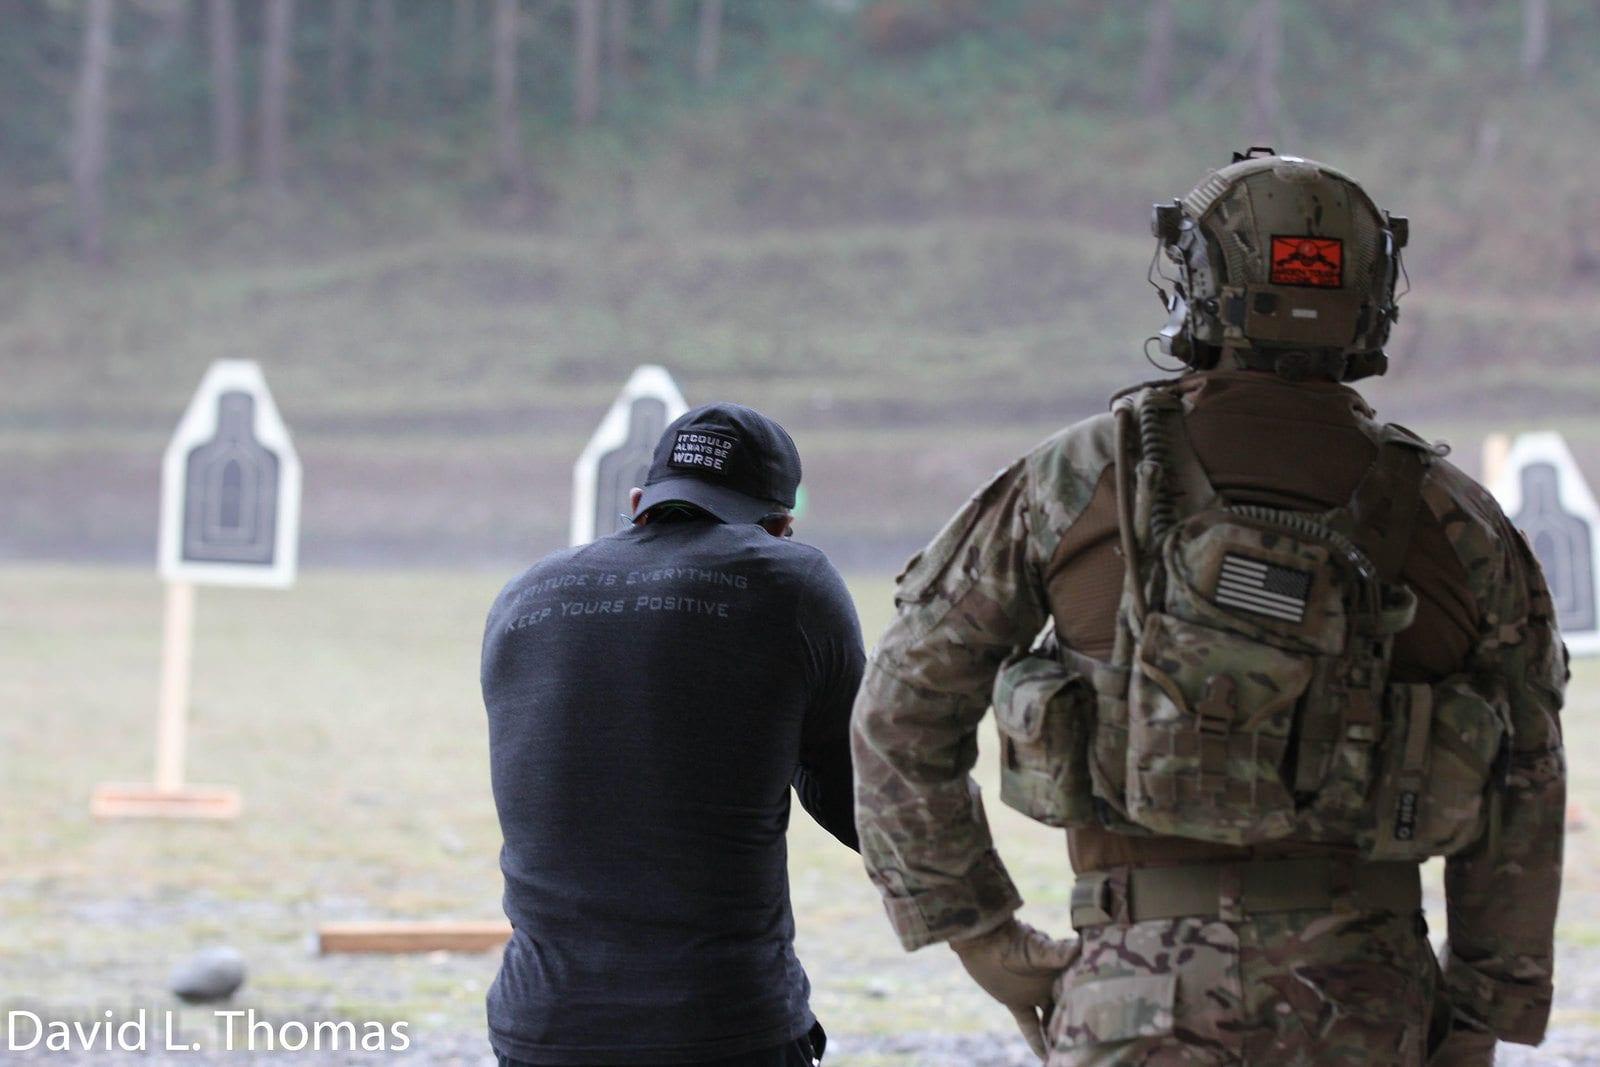 David Thomas Shooting